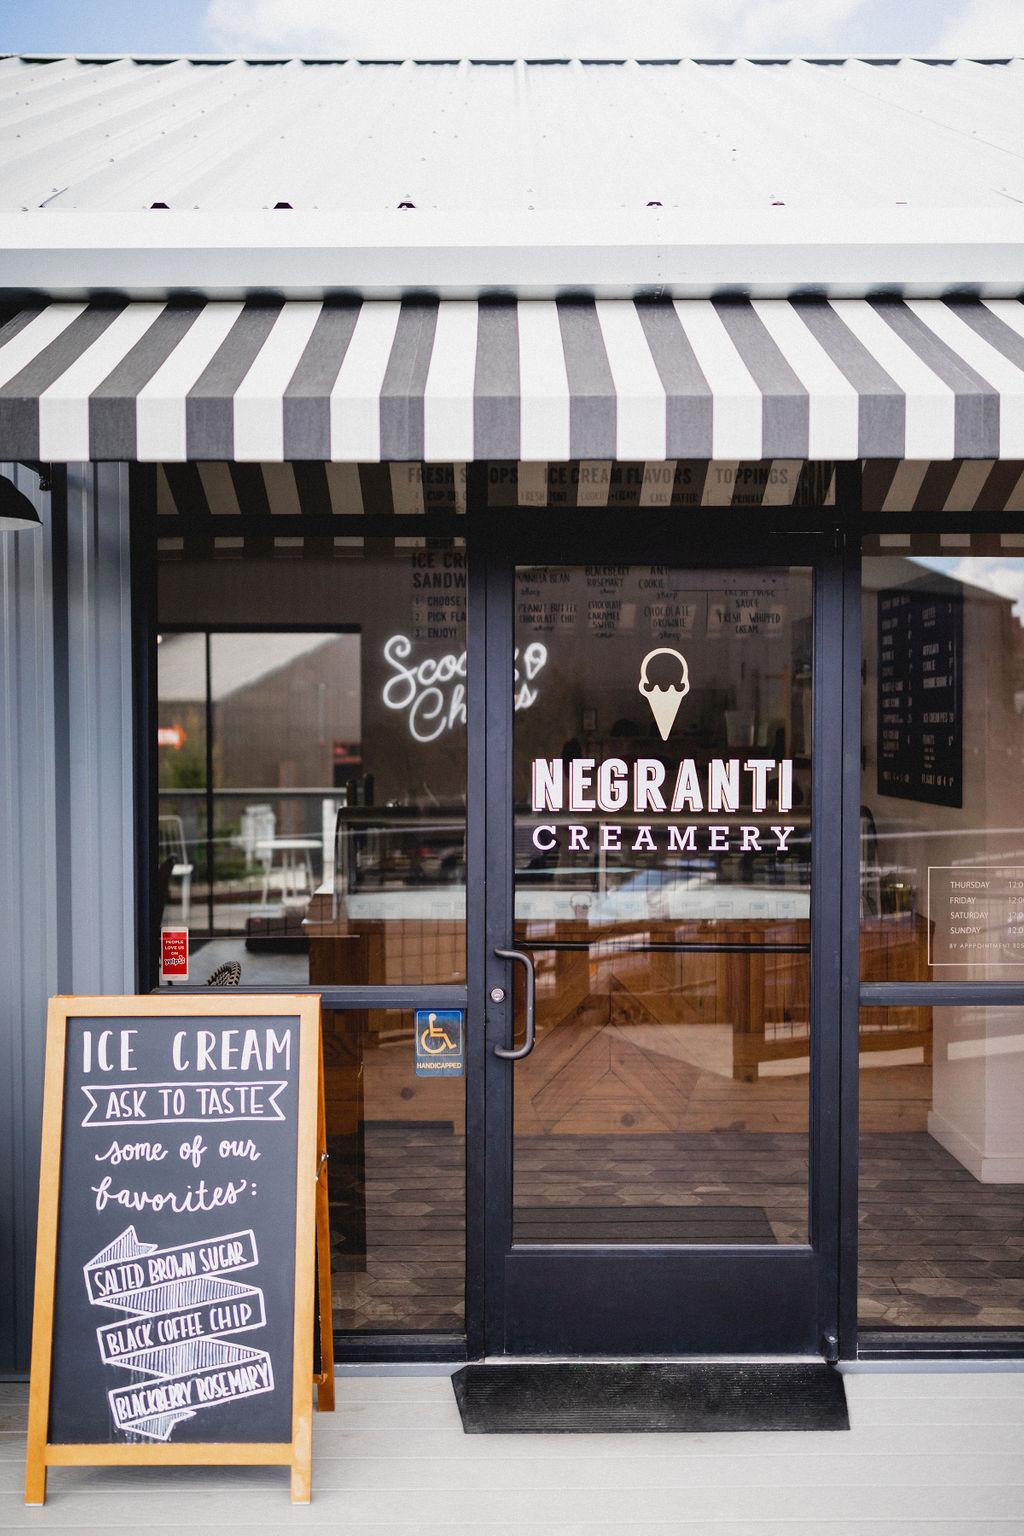 Negranti-Creamery-143.jpg